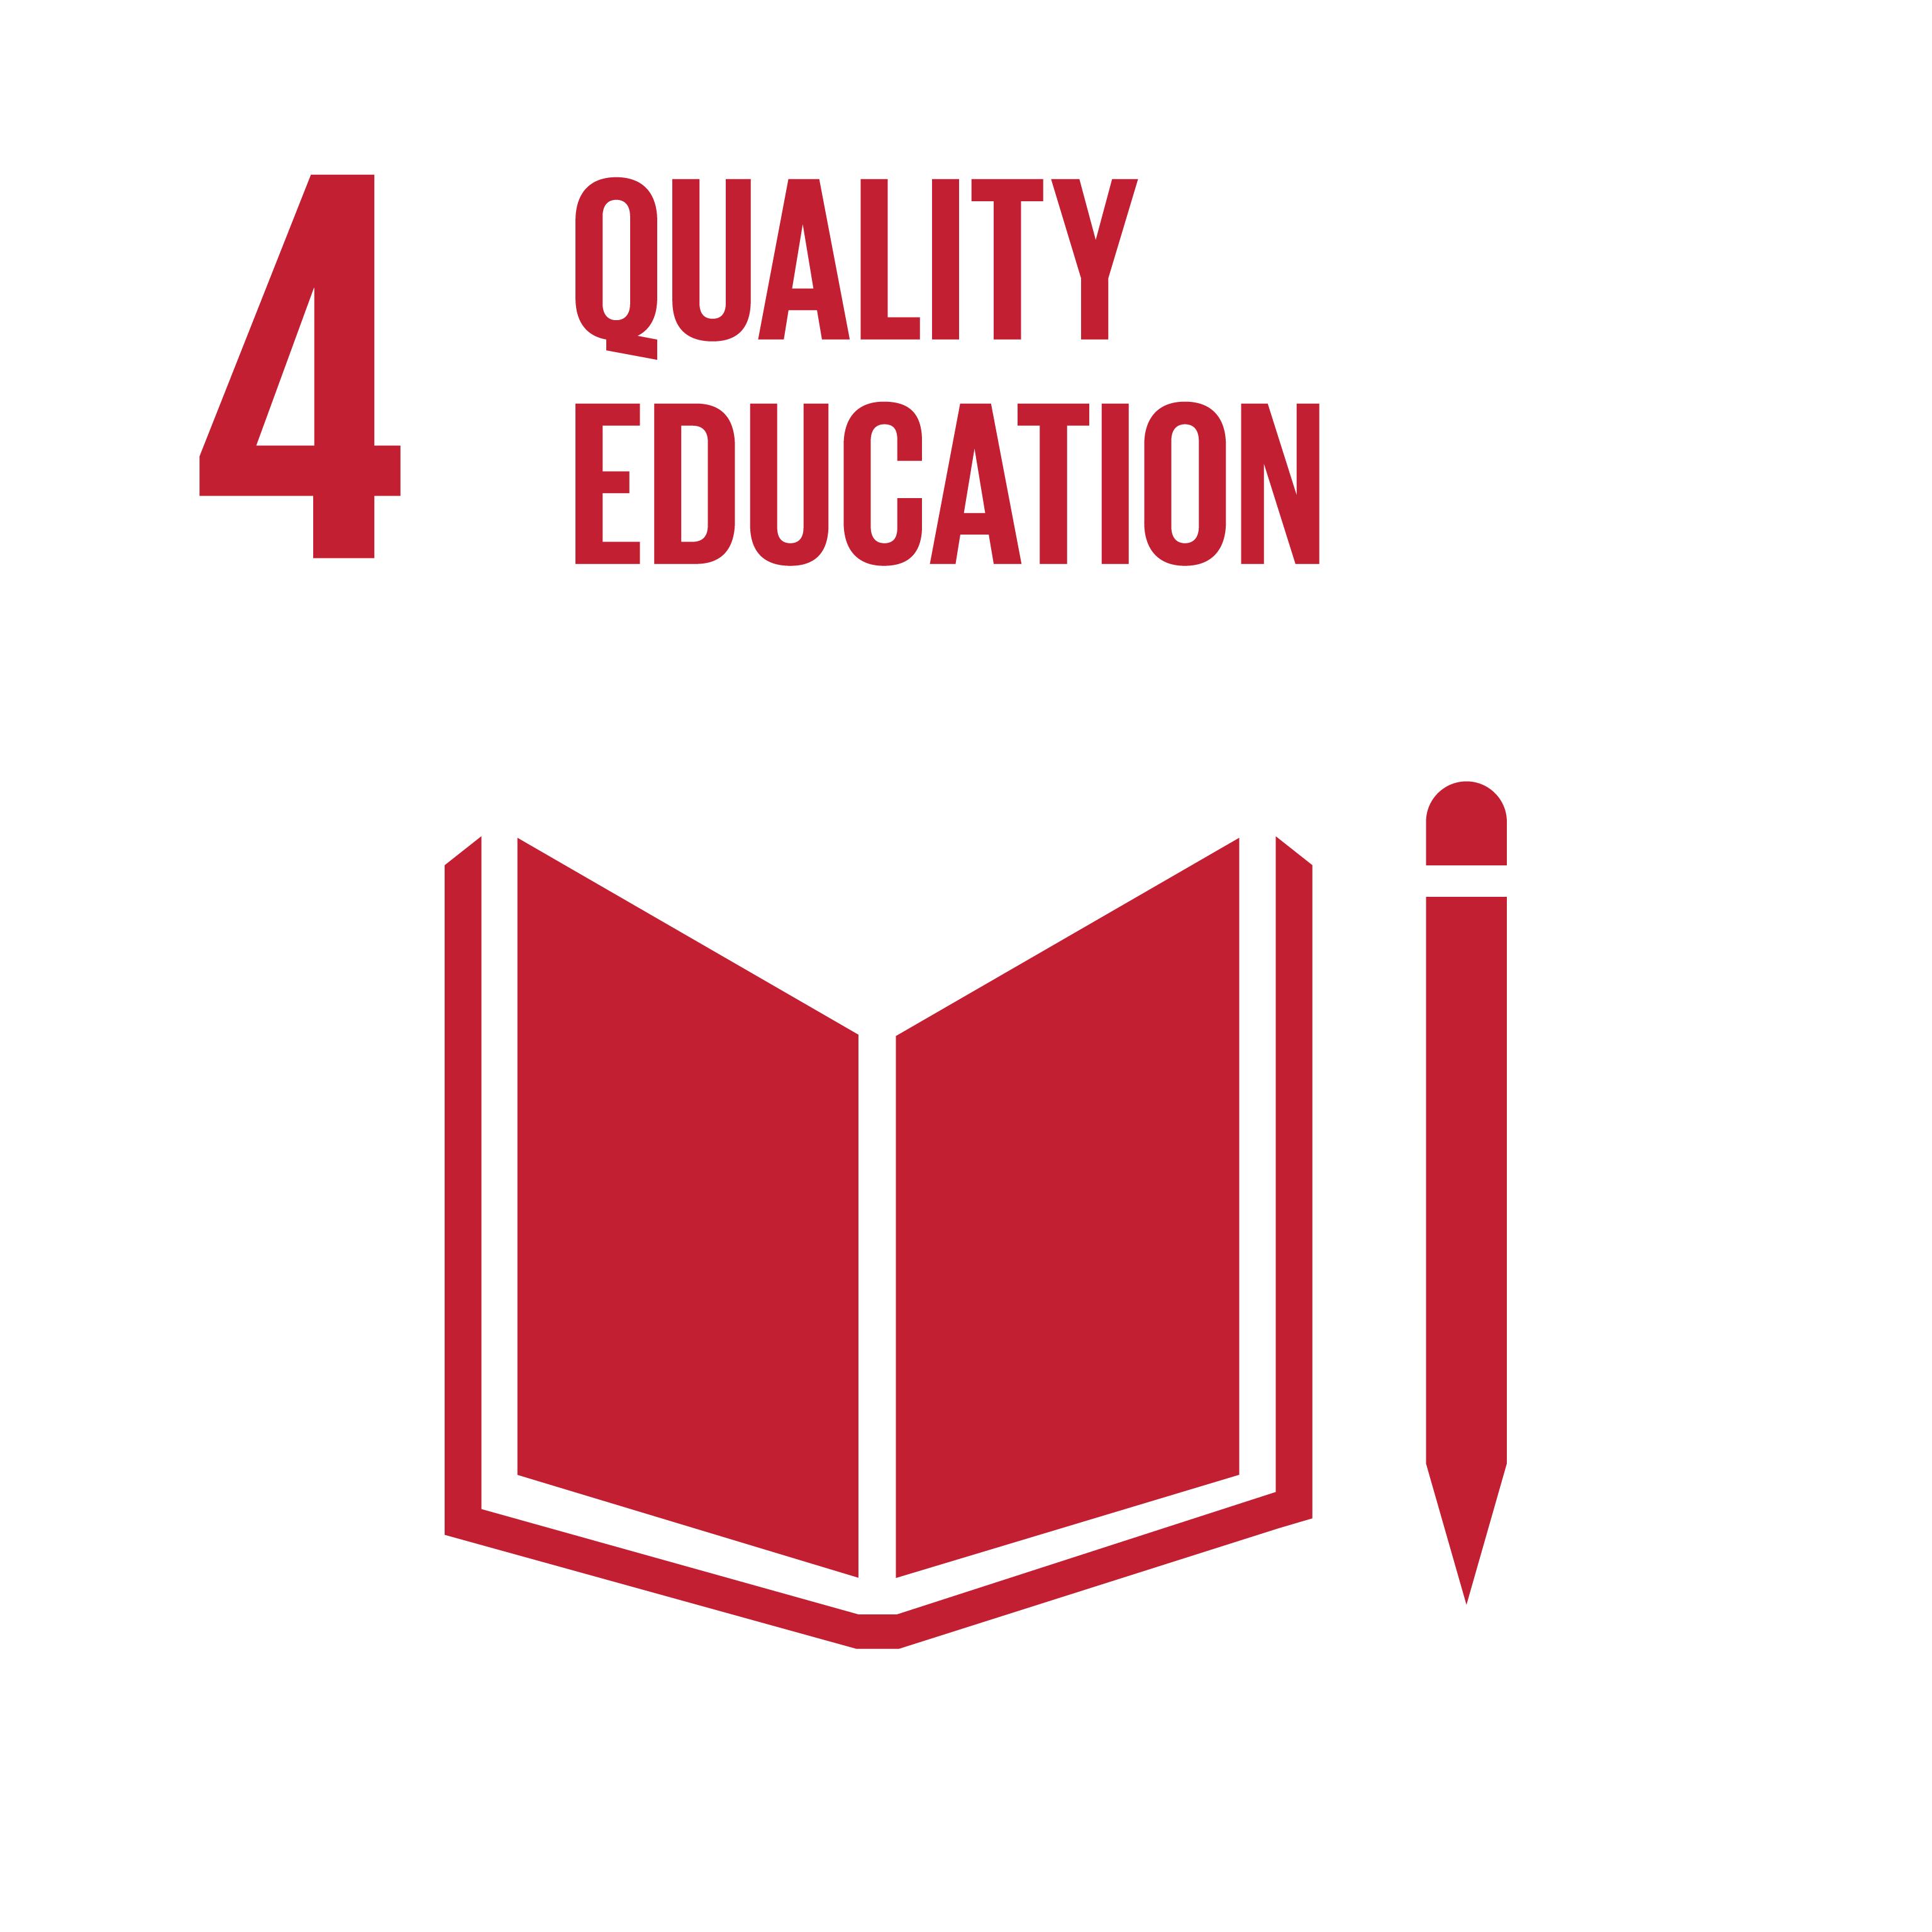 Quality Education on United Nations Logo